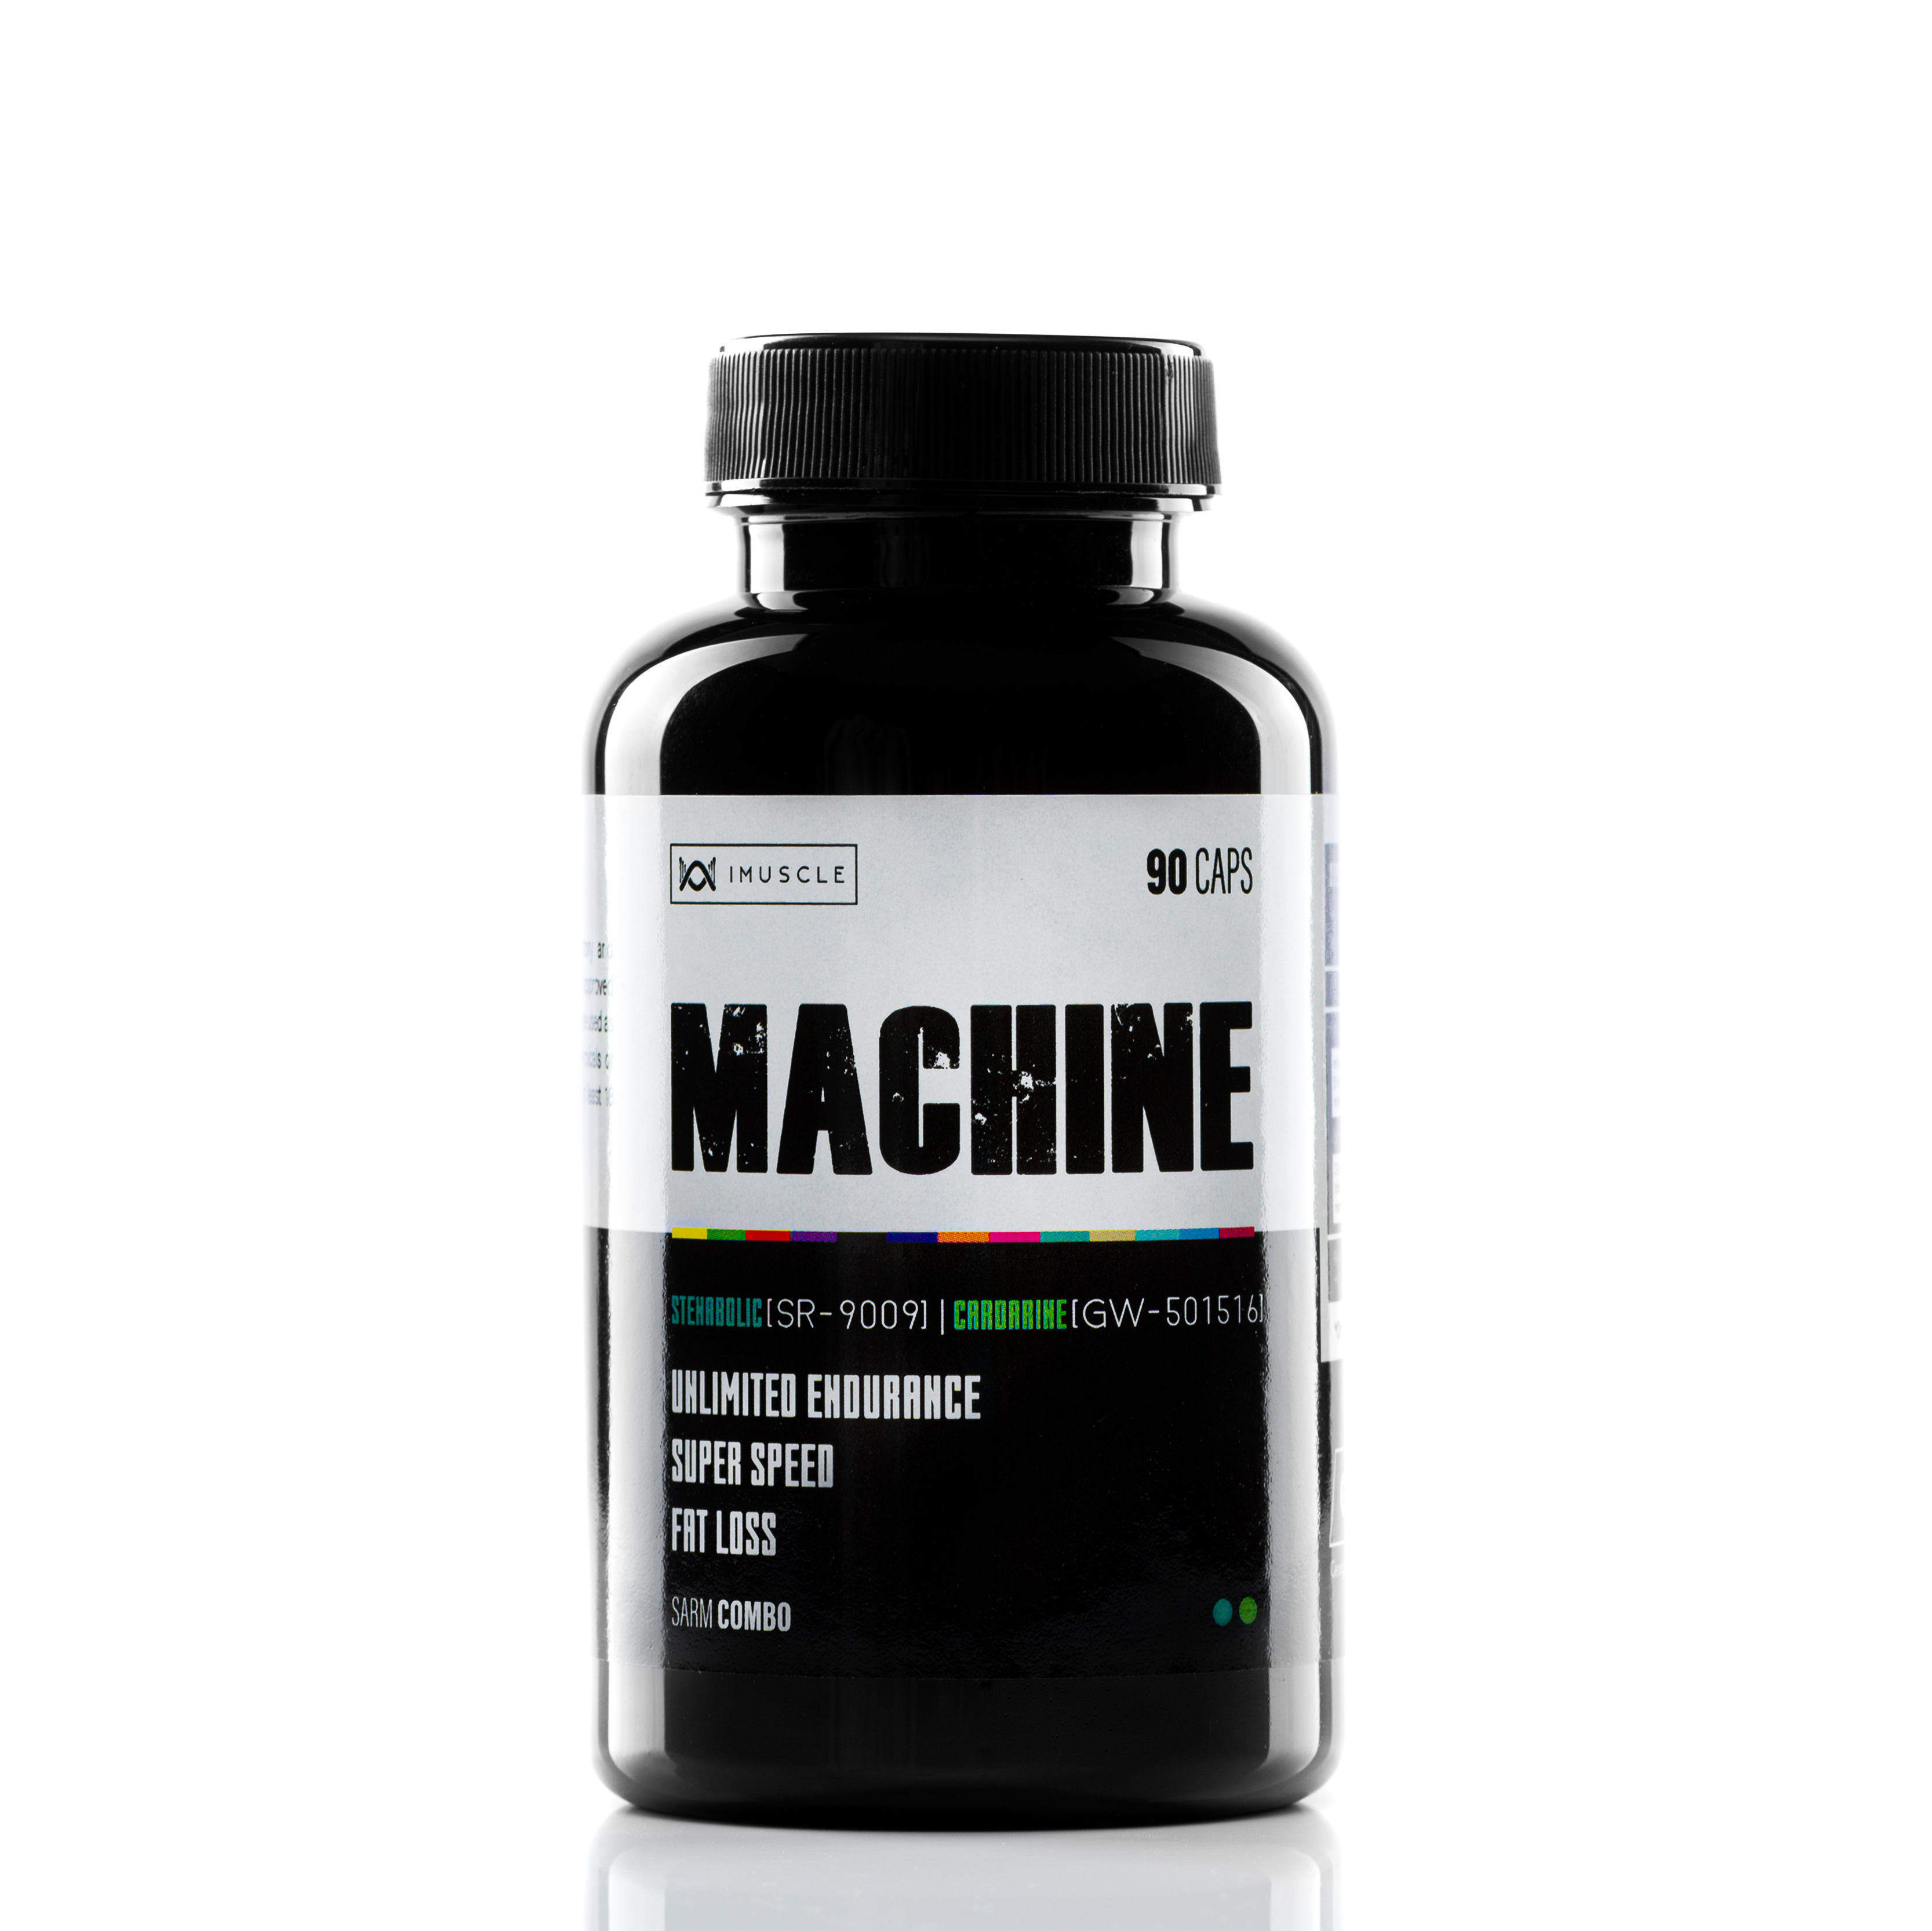 iMuscle Machine Combo sarms